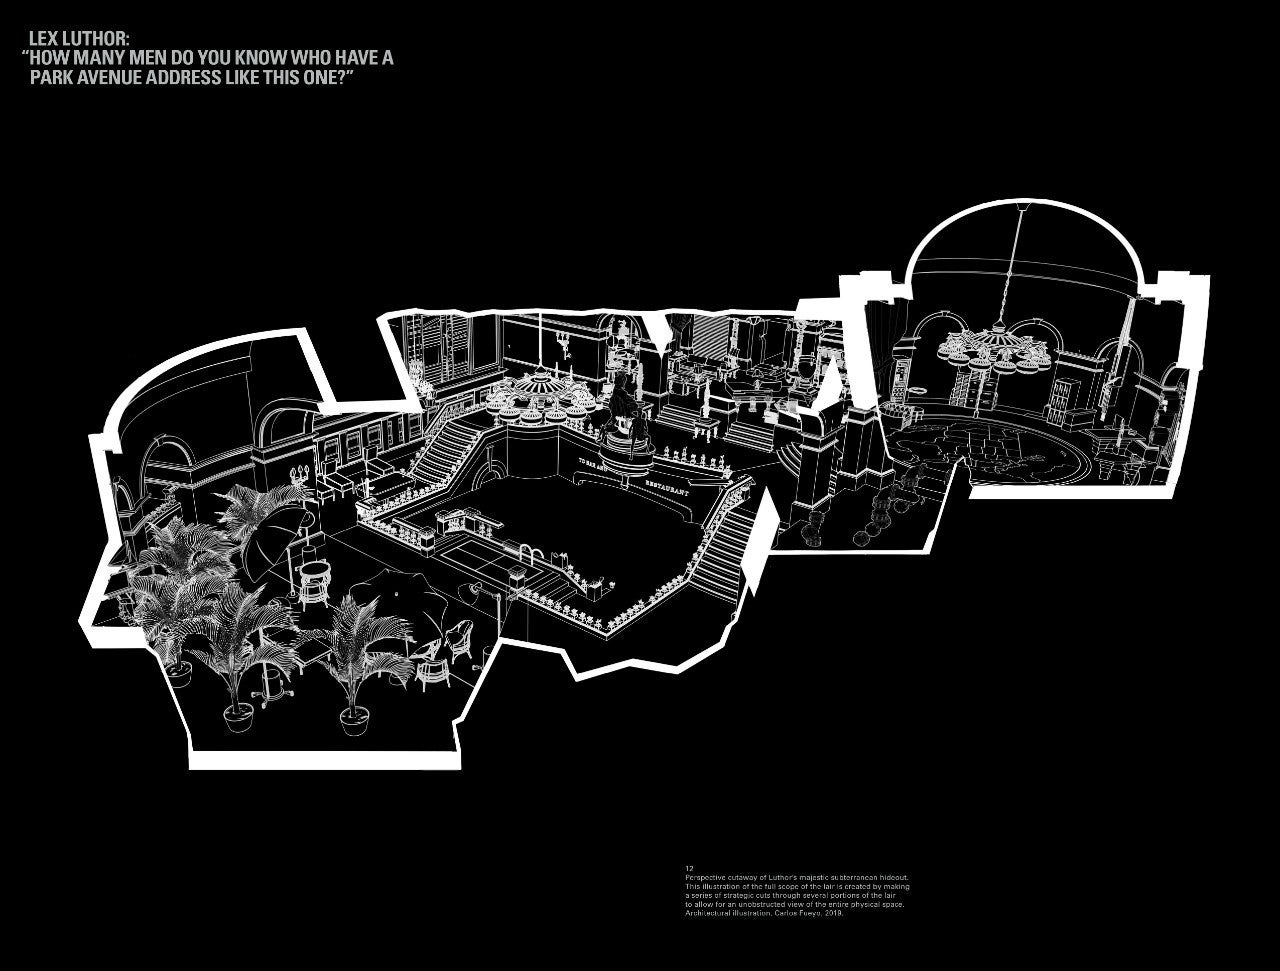 Lair-Superman-Grand Central Terminal 2 (Original Illustration)